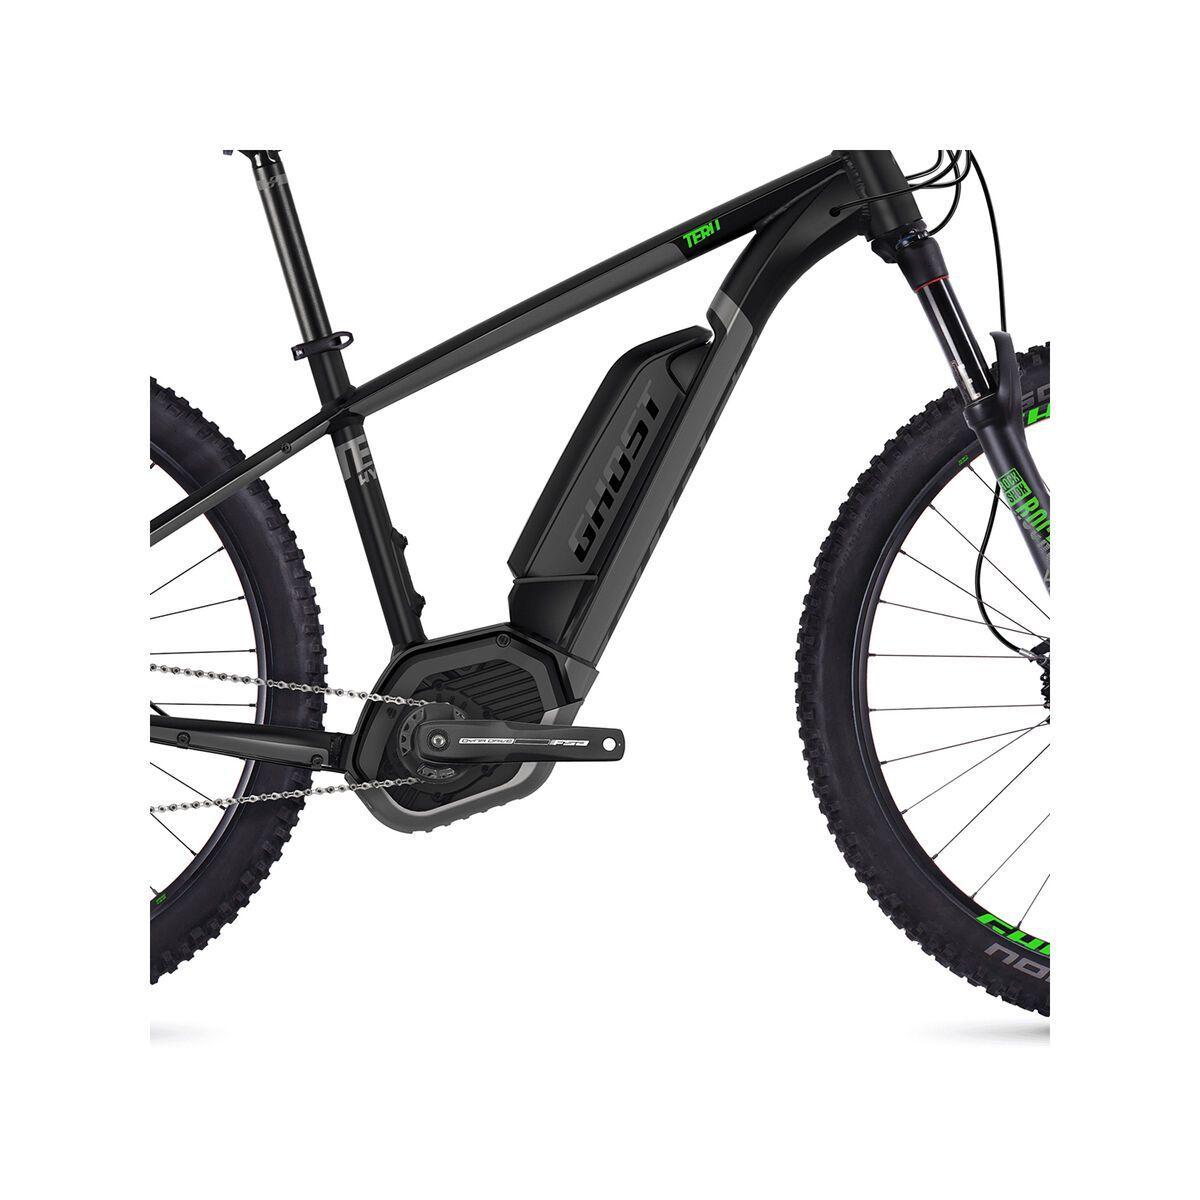 Ghost Hybride Teru B7.7+ AL, black/gray/neon green   Bild 3